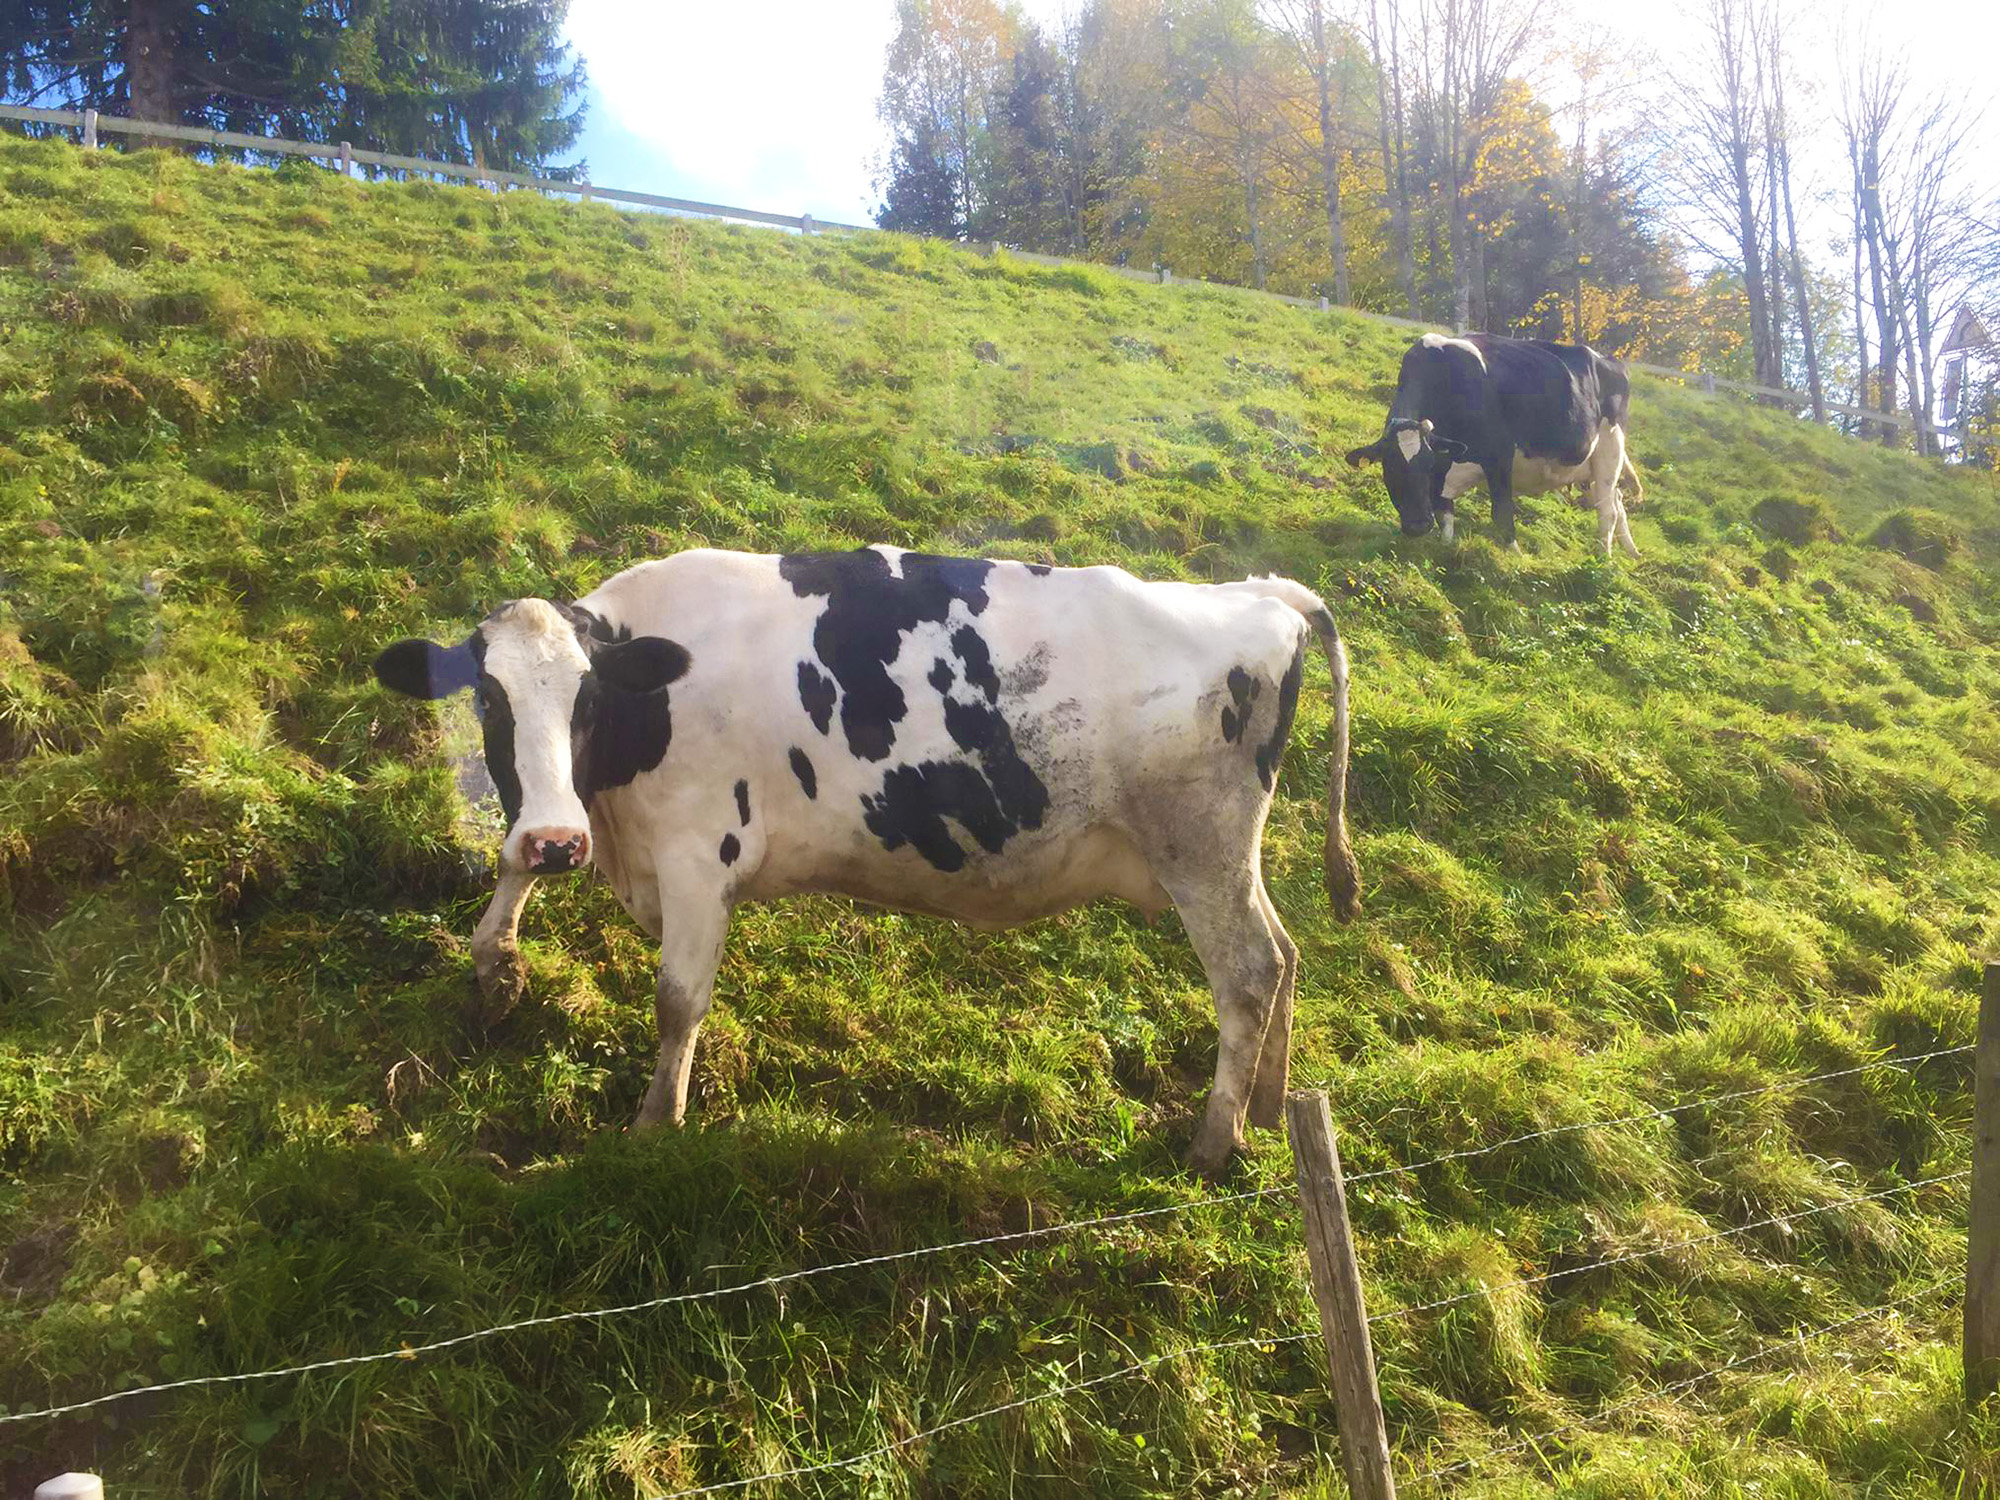 kt_2020_350_Keytours_excursions_Swisstours_gruyères_village13_2048_10